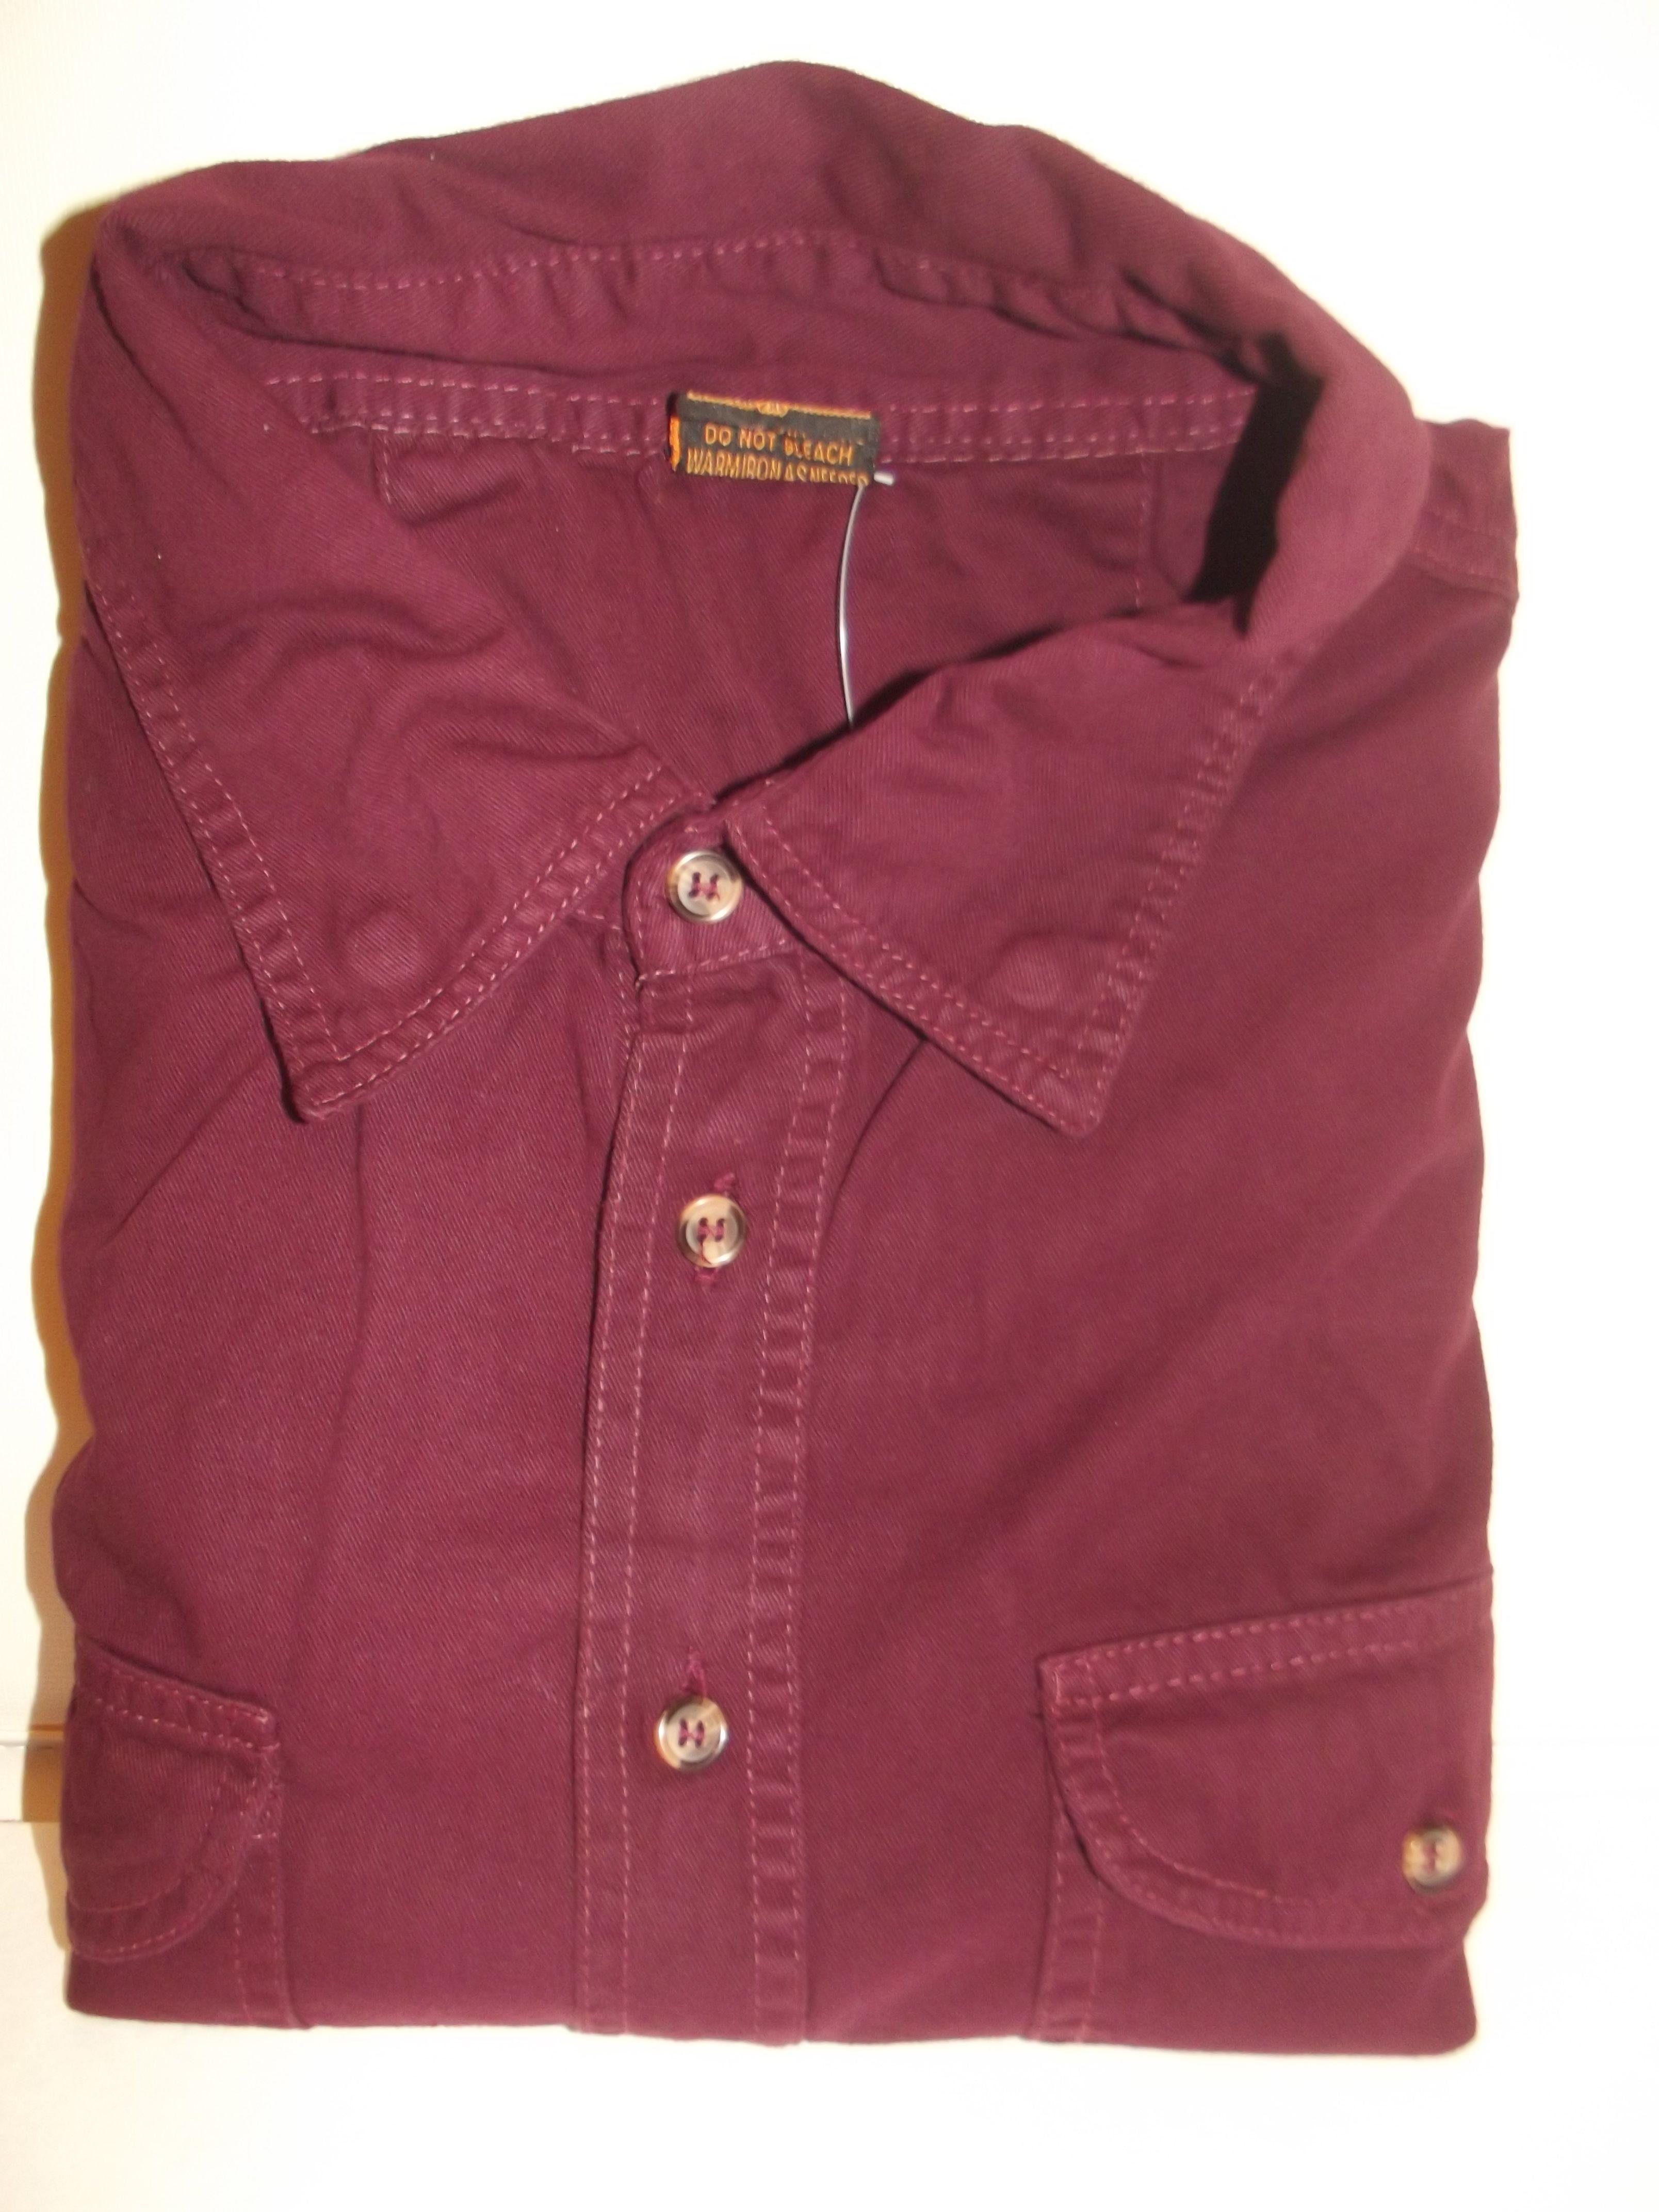 Flannel jacket with wool lining  Mens Motorcycle Biker Shirt Burgundy Cut Off Sleeveless Cotton Denim